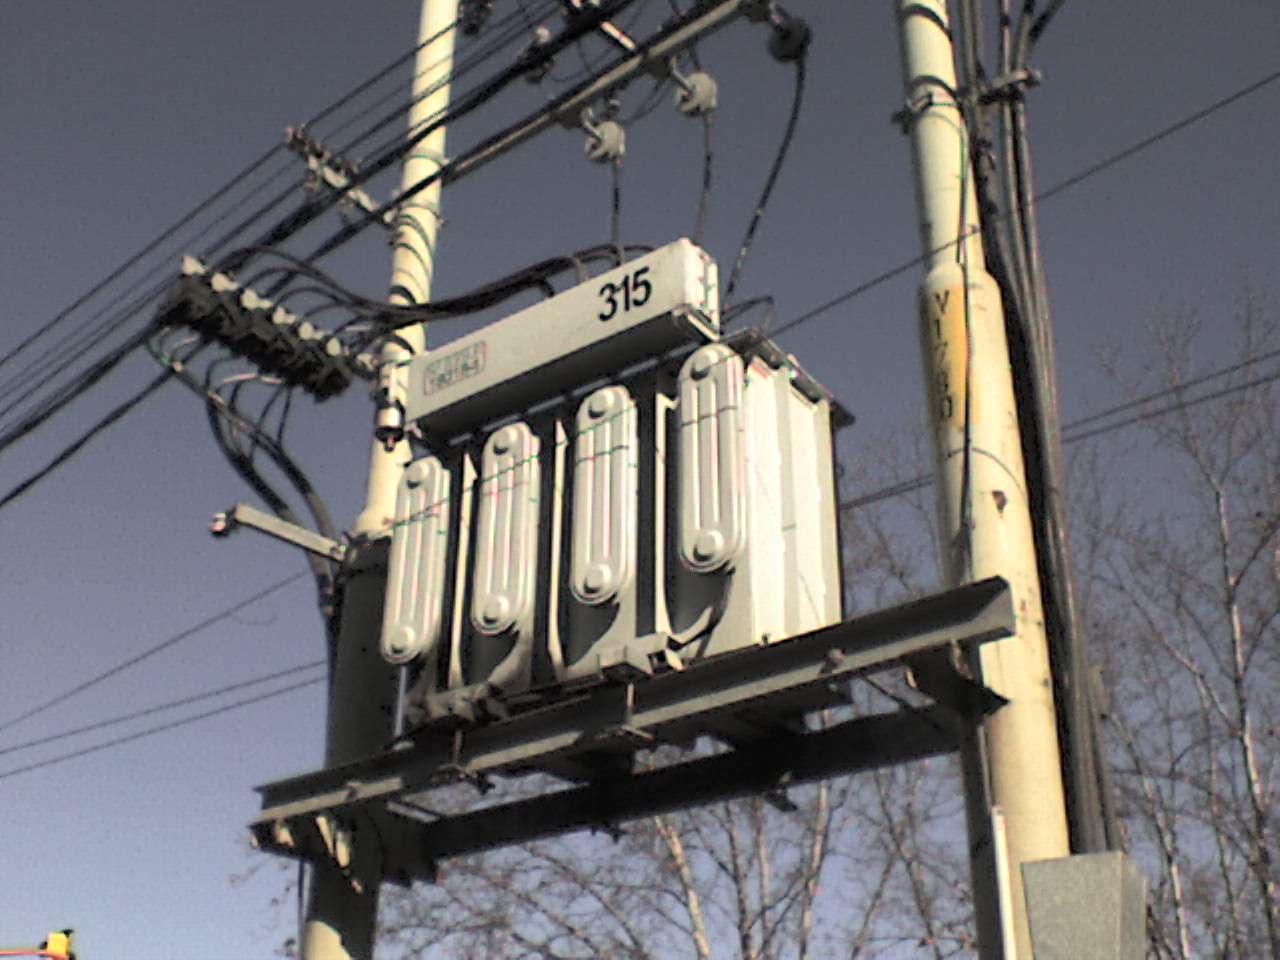 File:Transformador de PCV.JPG - Wikimedia Commons